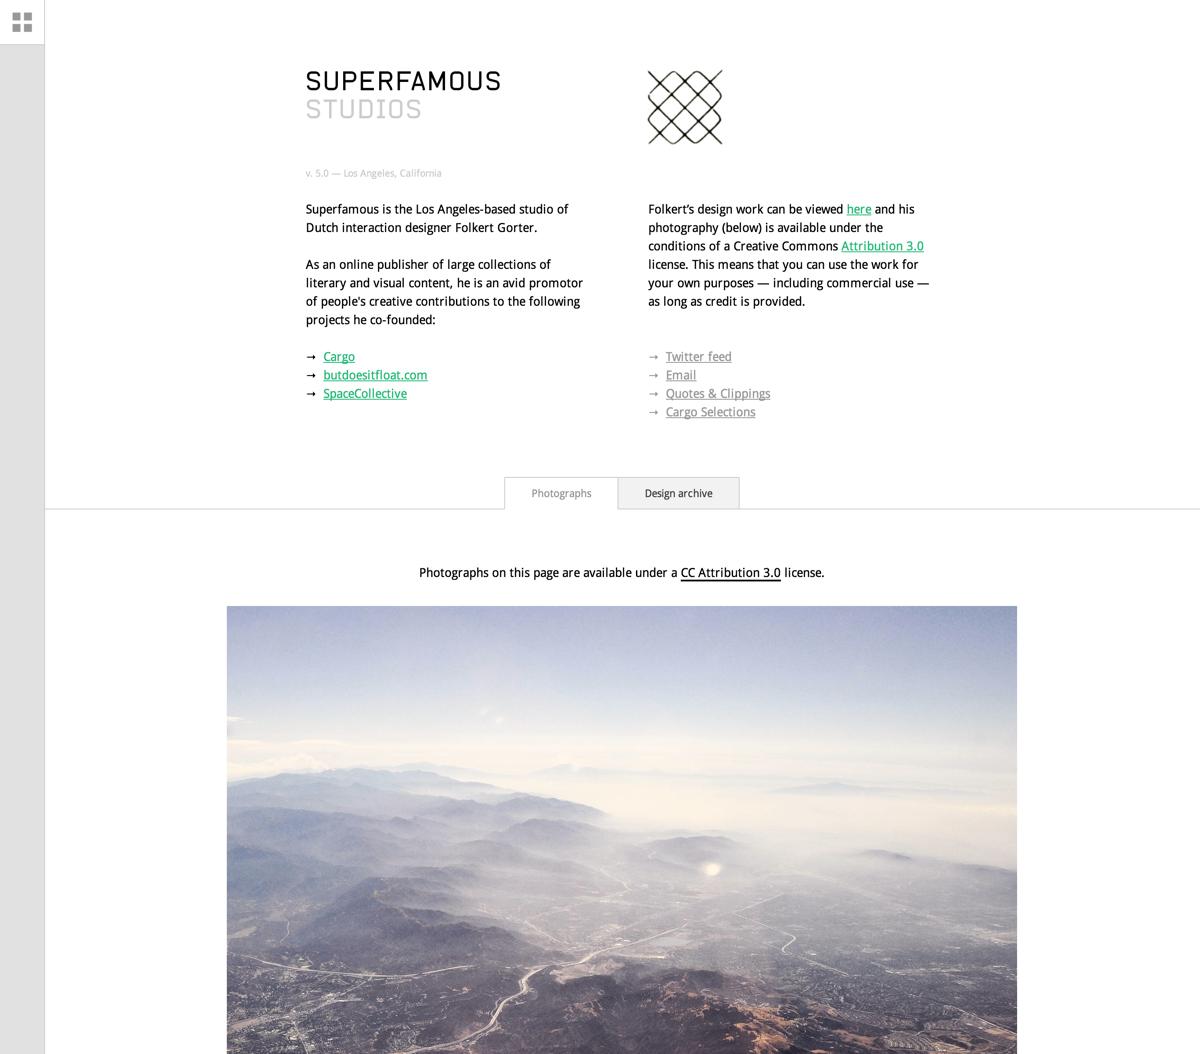 superfamous folkert gorter 20140621 25 Free Stock Photo Websites